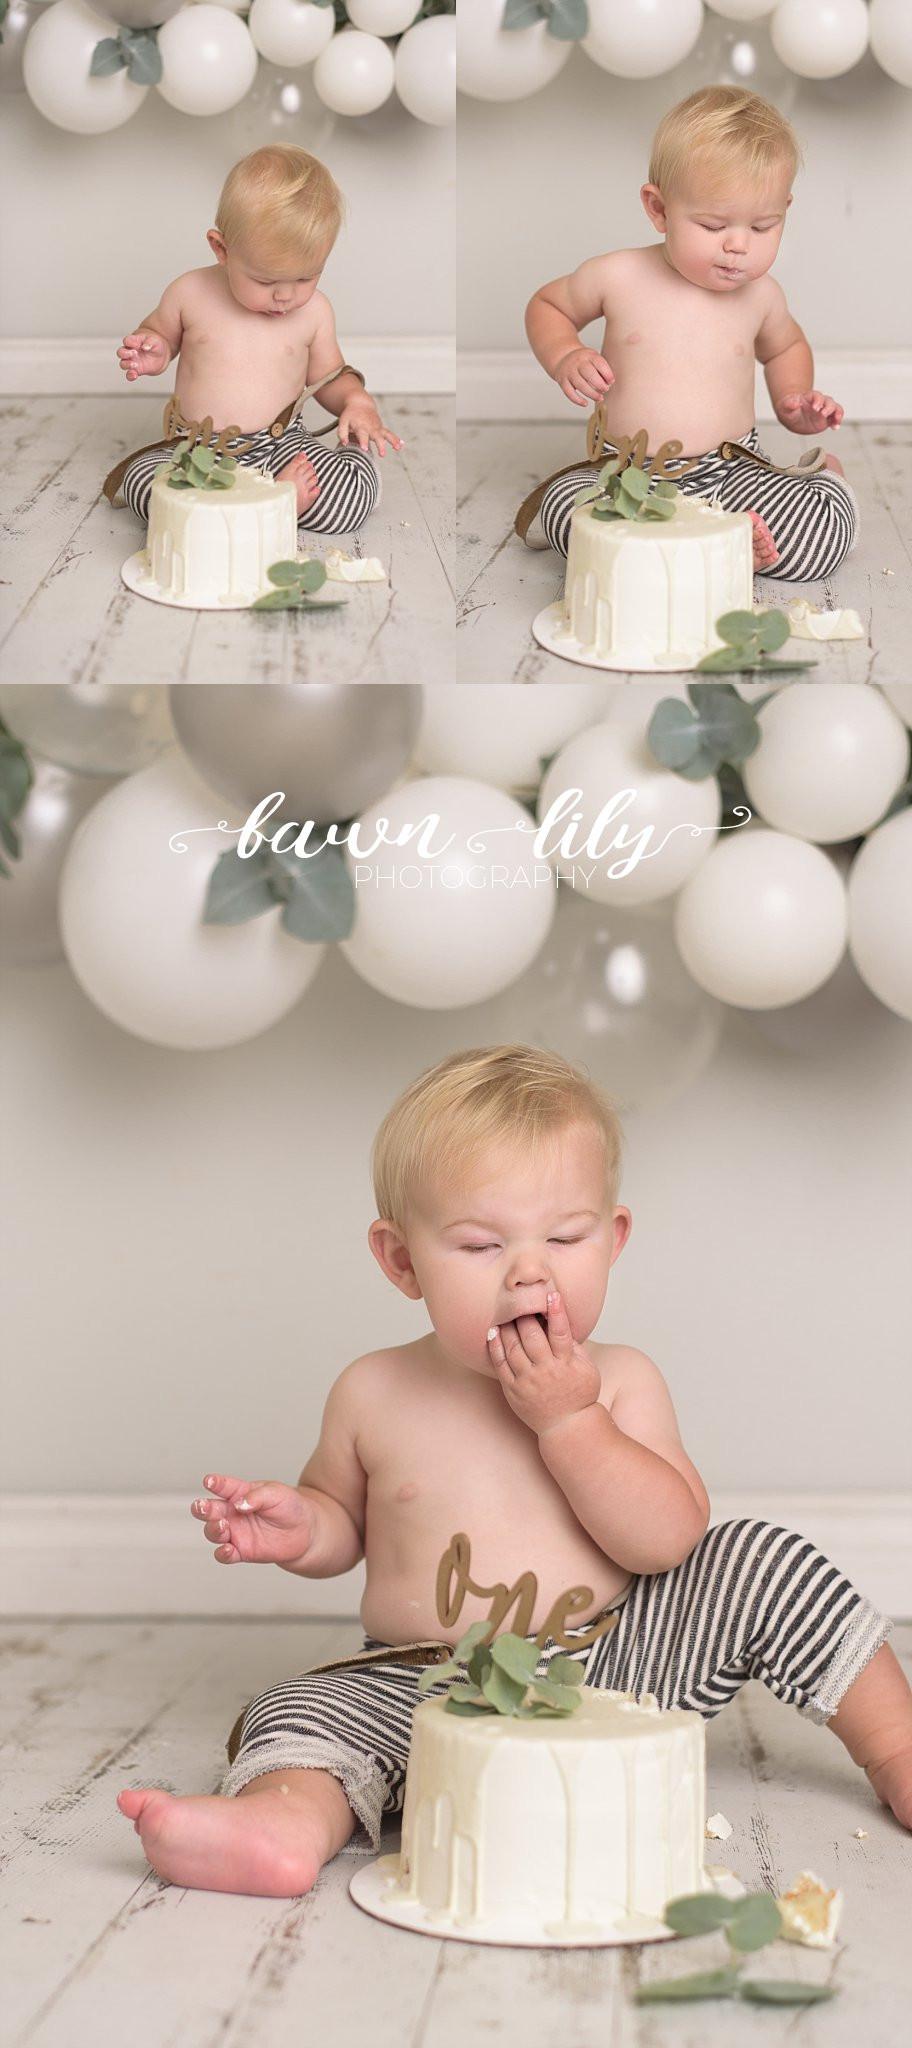 Victoria BC Baby Photography, Victoria BC Photographer, Cake Smash